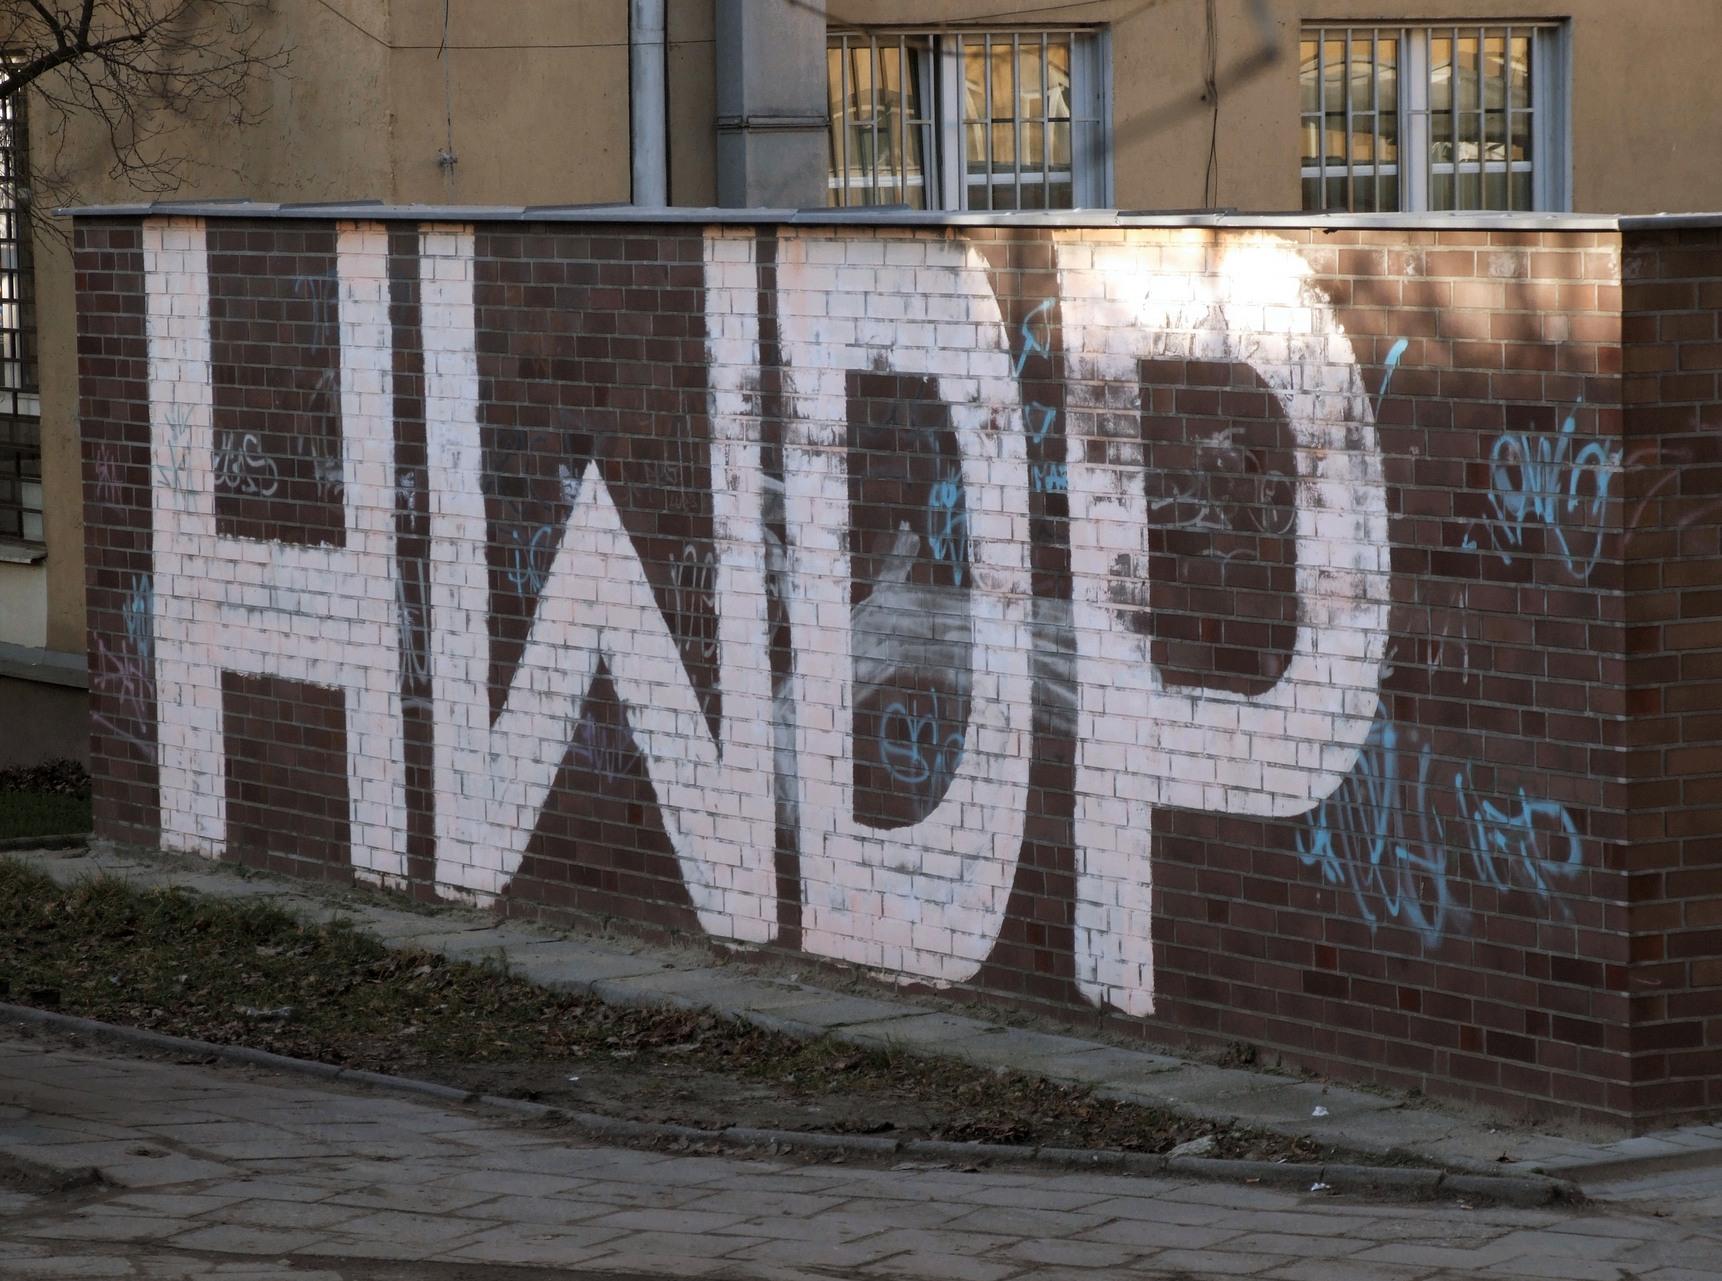 napis na murze hwdp